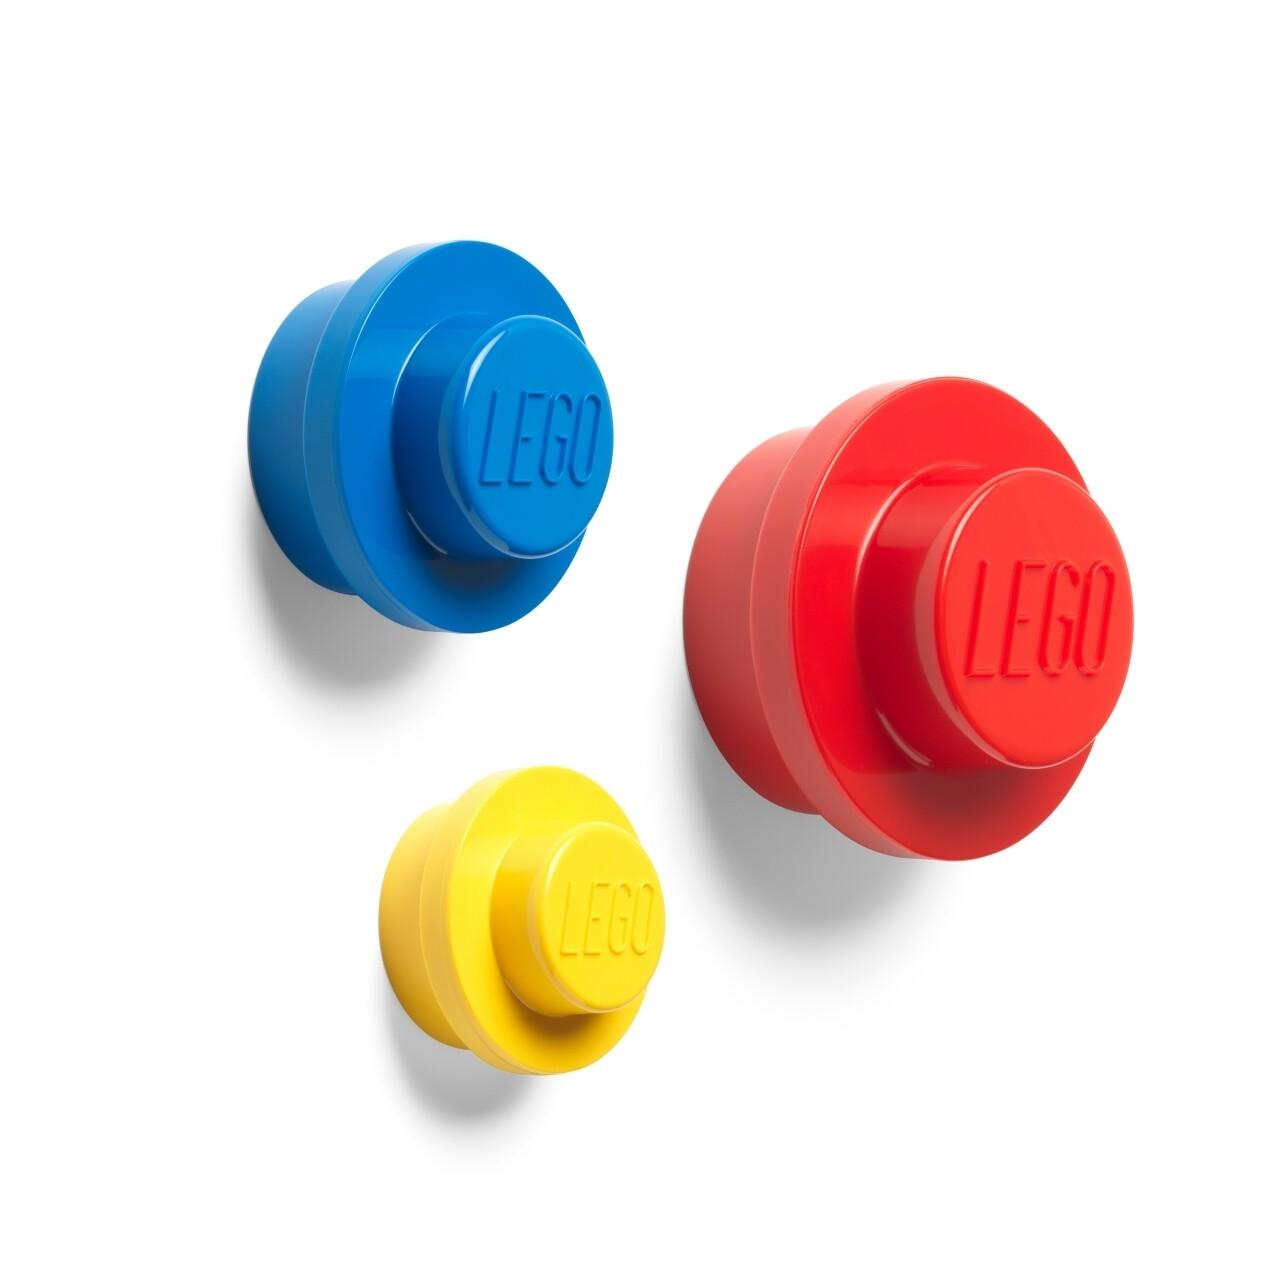 Set 3 carlige pentru perete LEGO, 94 cm/78.5 cm/47 cm, ABS, rosu/galben/albastru